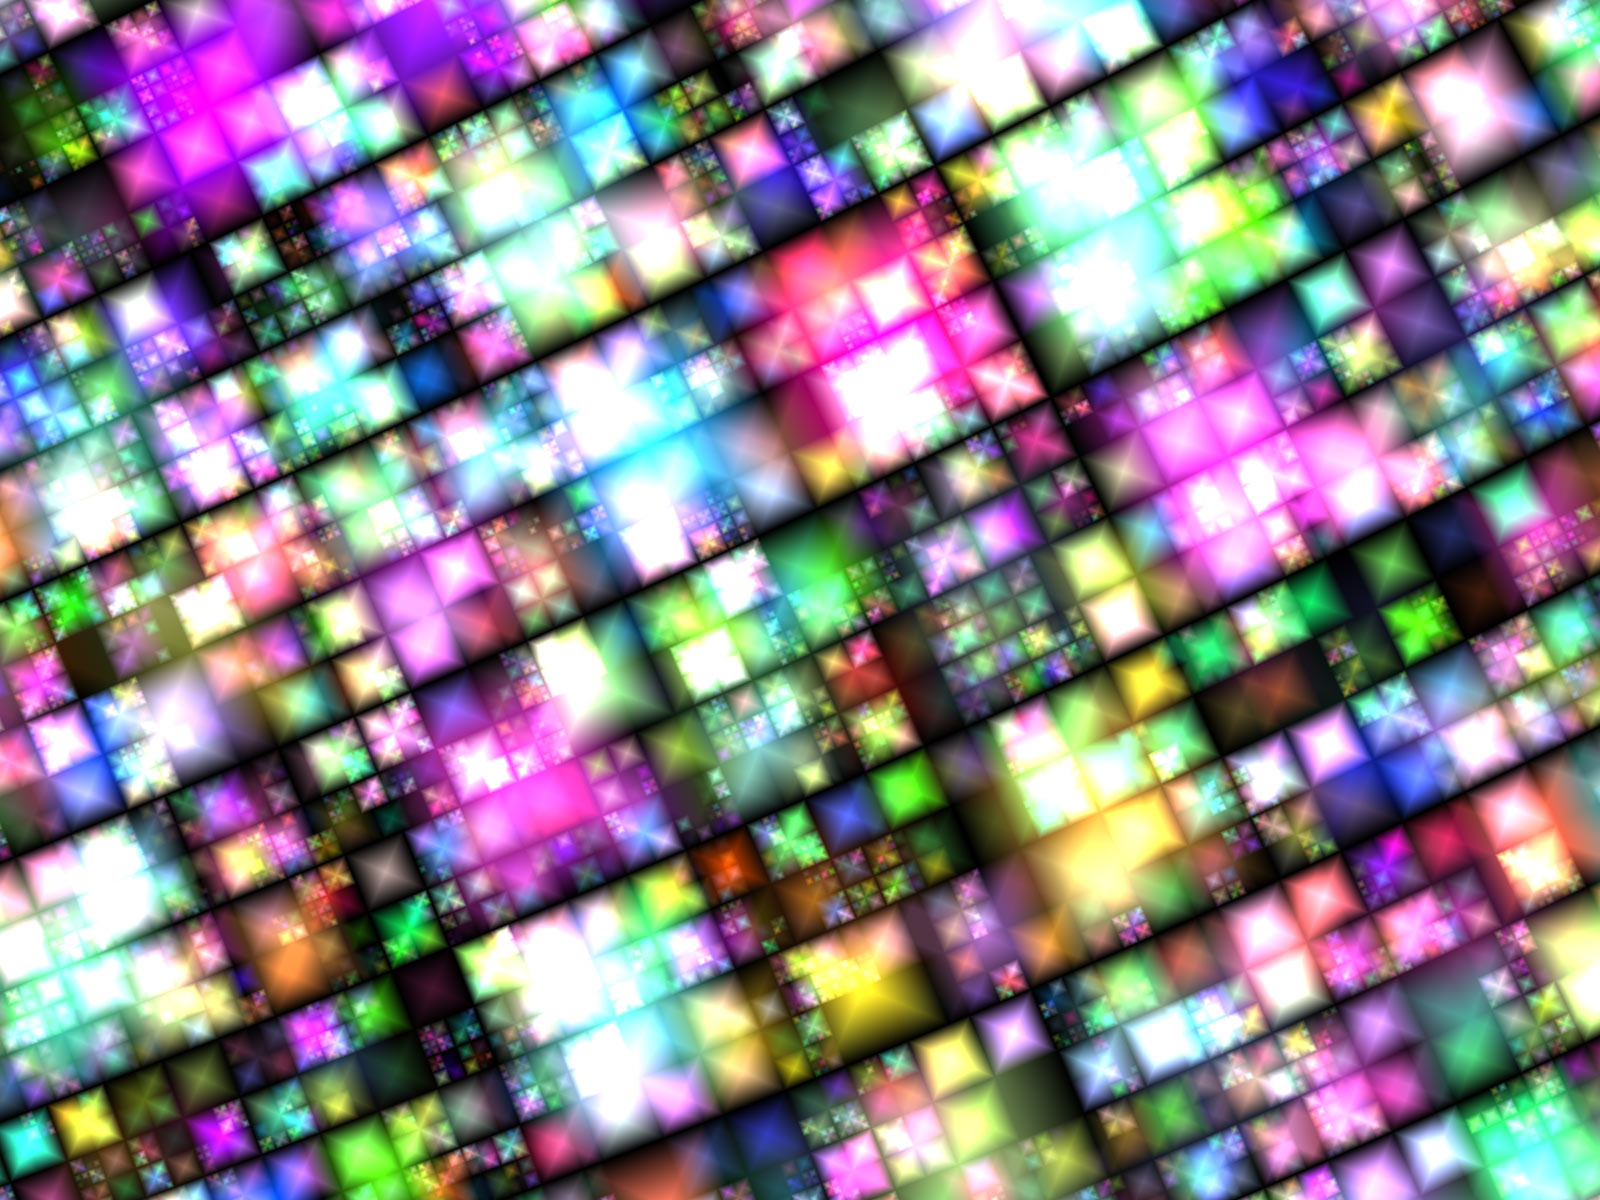 Small Coloured Diamonds   Cool Desktop Background   1600x1200 pixels 1600x1200